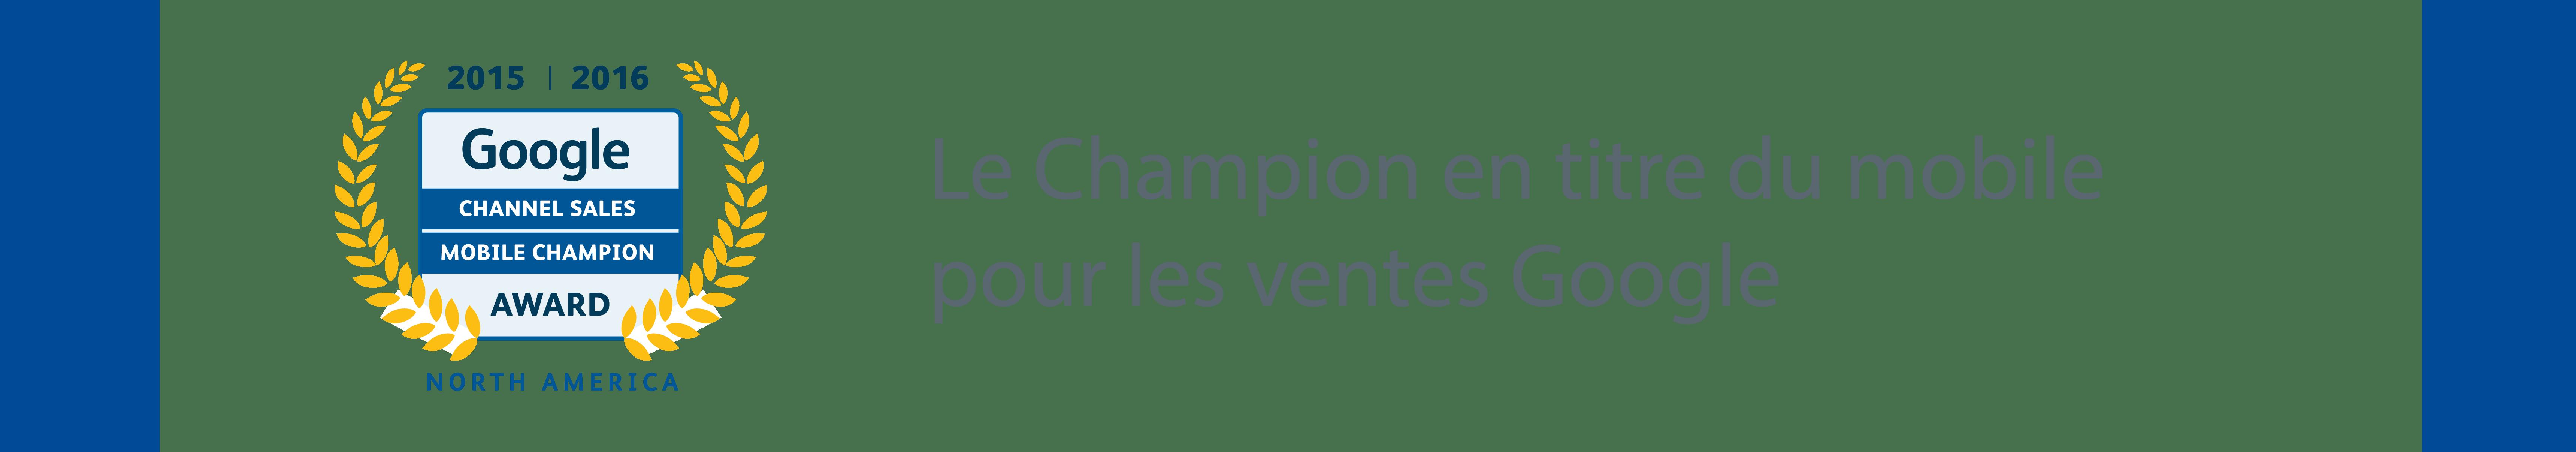 french google